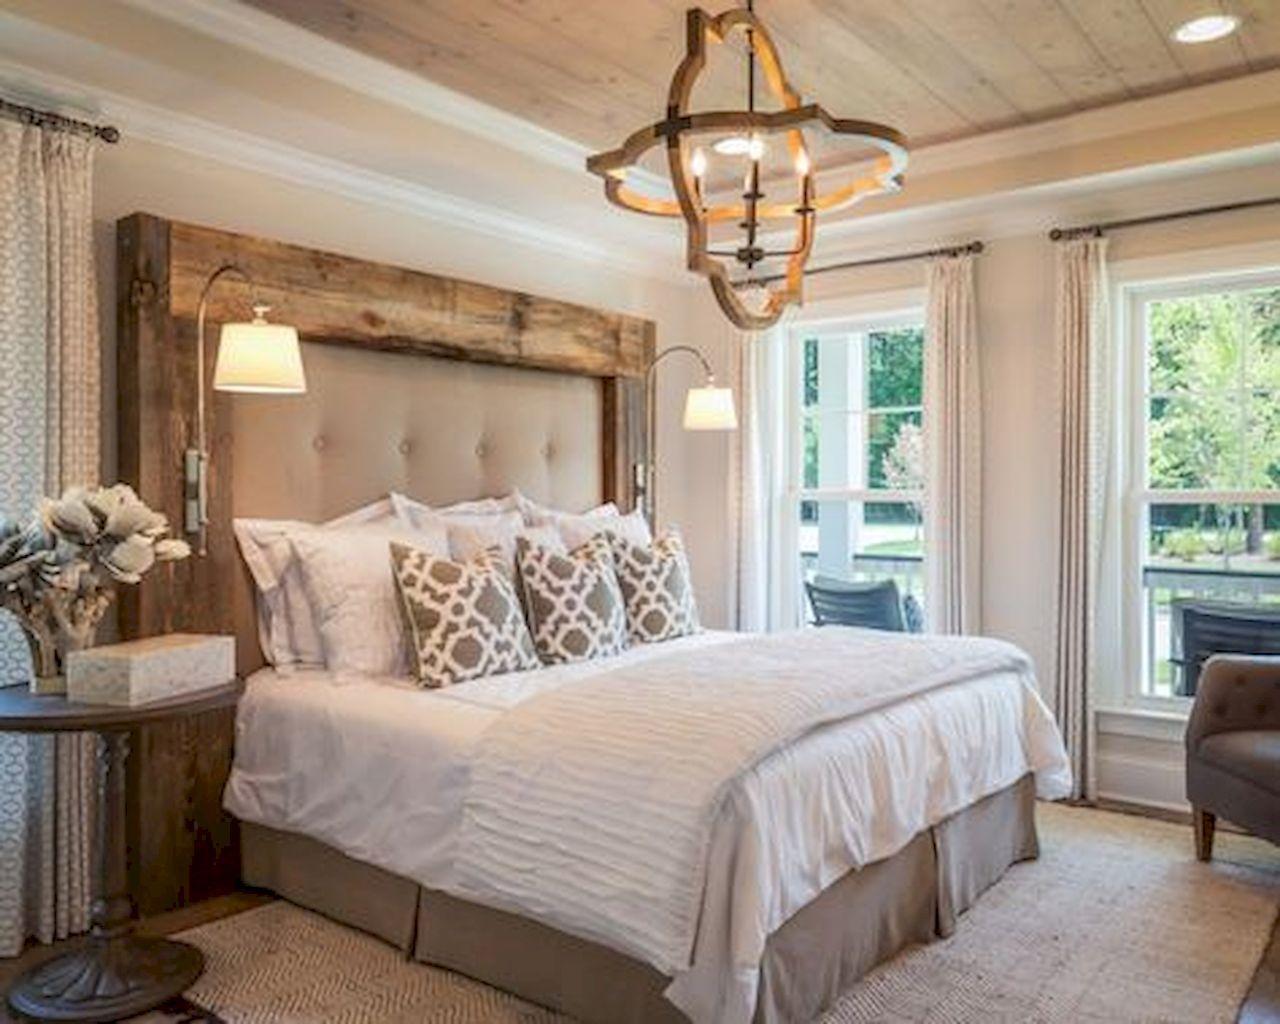 Large master bedroom decor ideas   Urban Farmhouse Master Bedroom Remodel Ideas  Farmhouse master